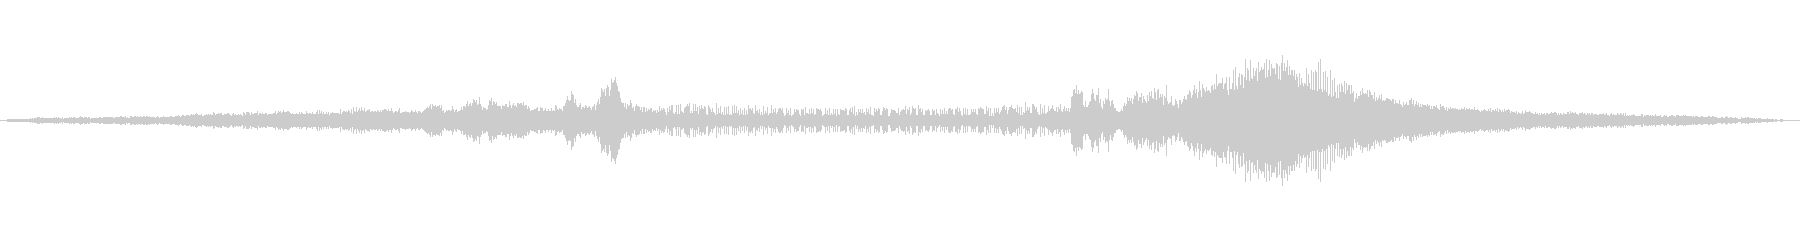 PROPANE:INT:プルアップ...の未再生の波形